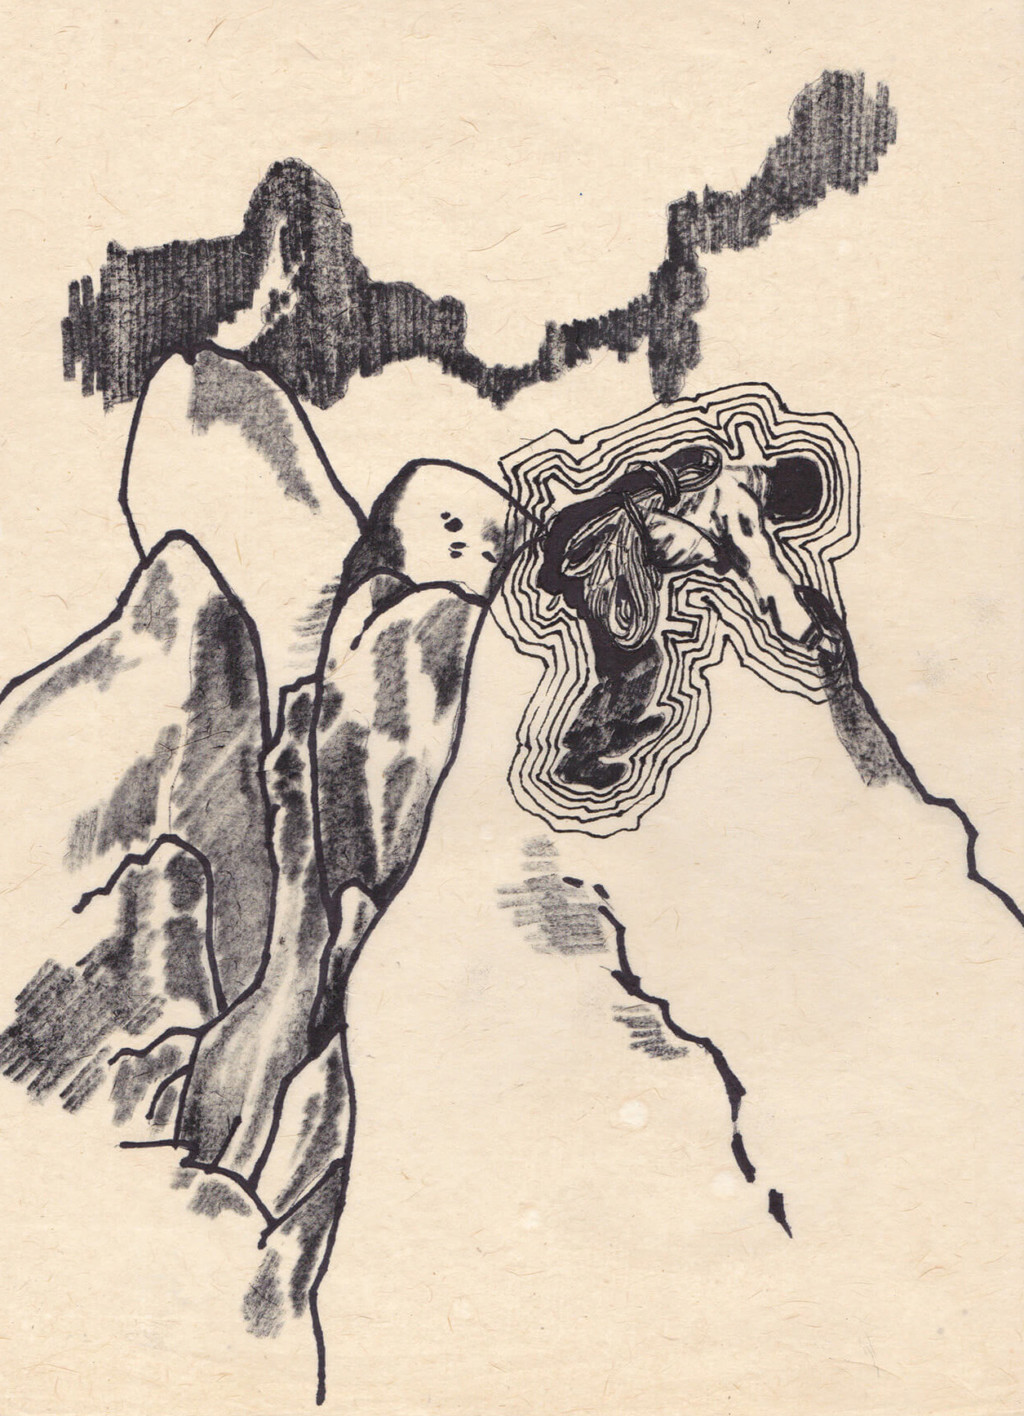 Jan Brauer Archive